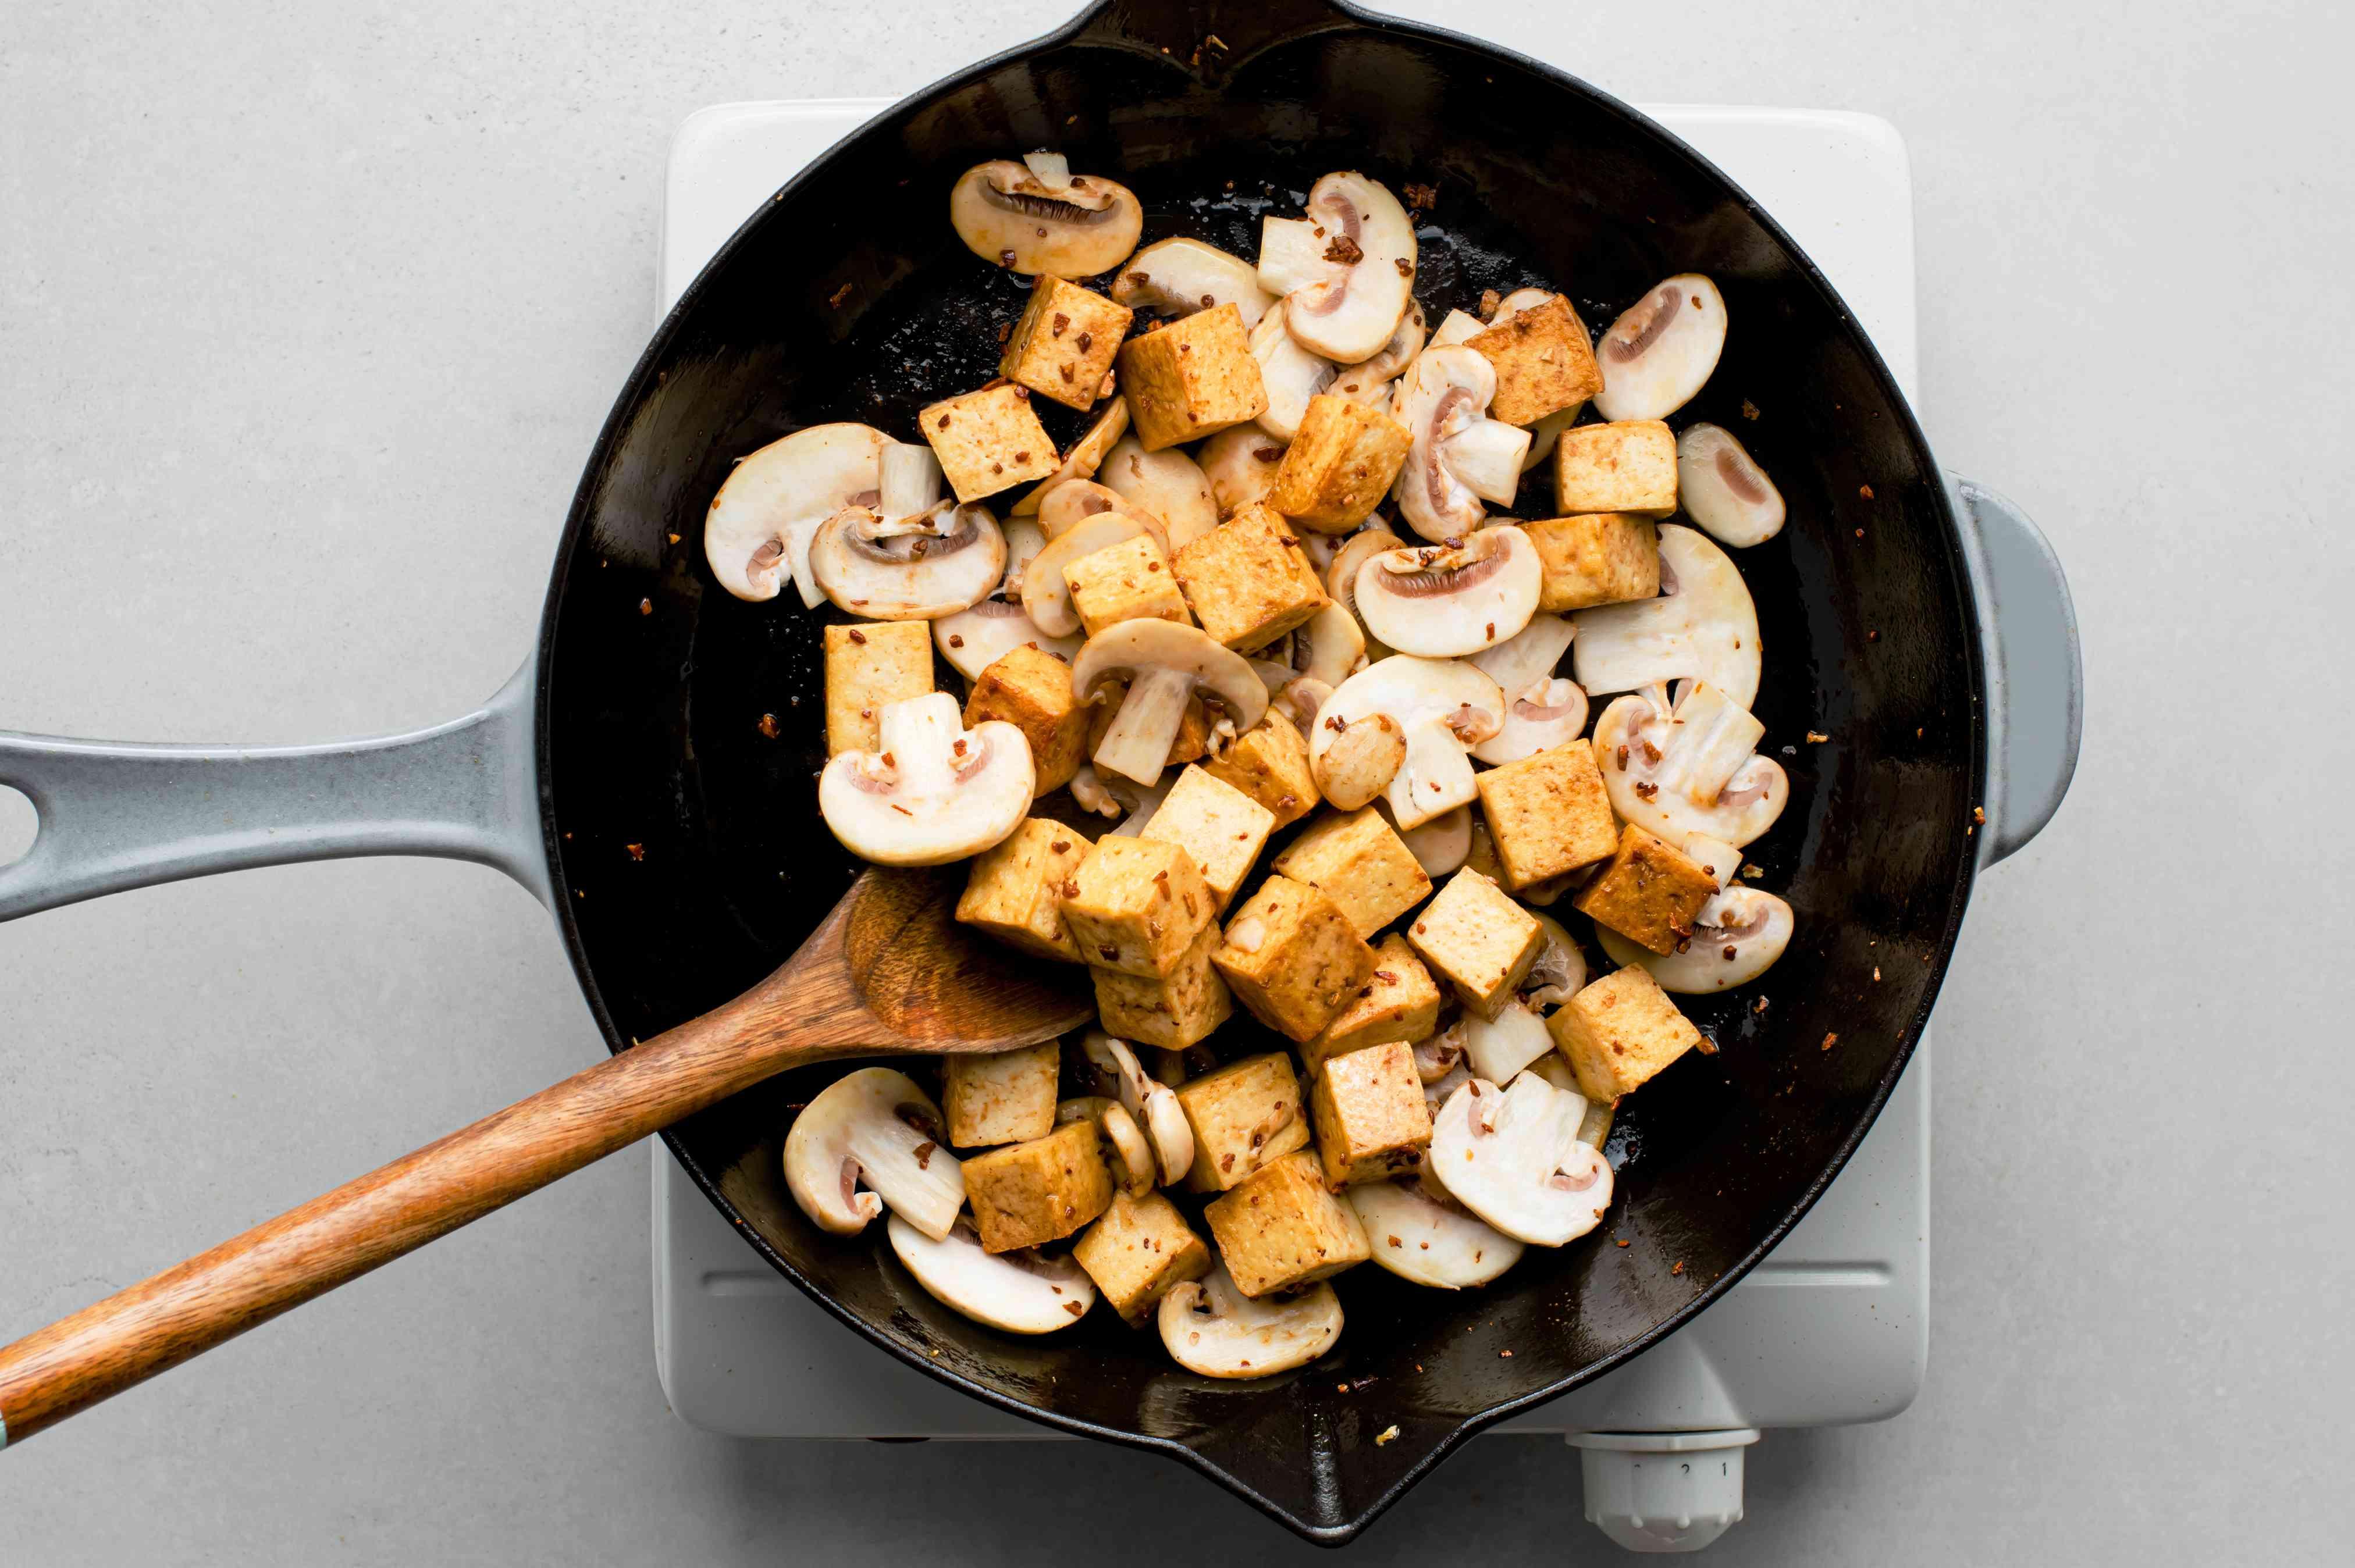 mushrooms and tofu in a skillet